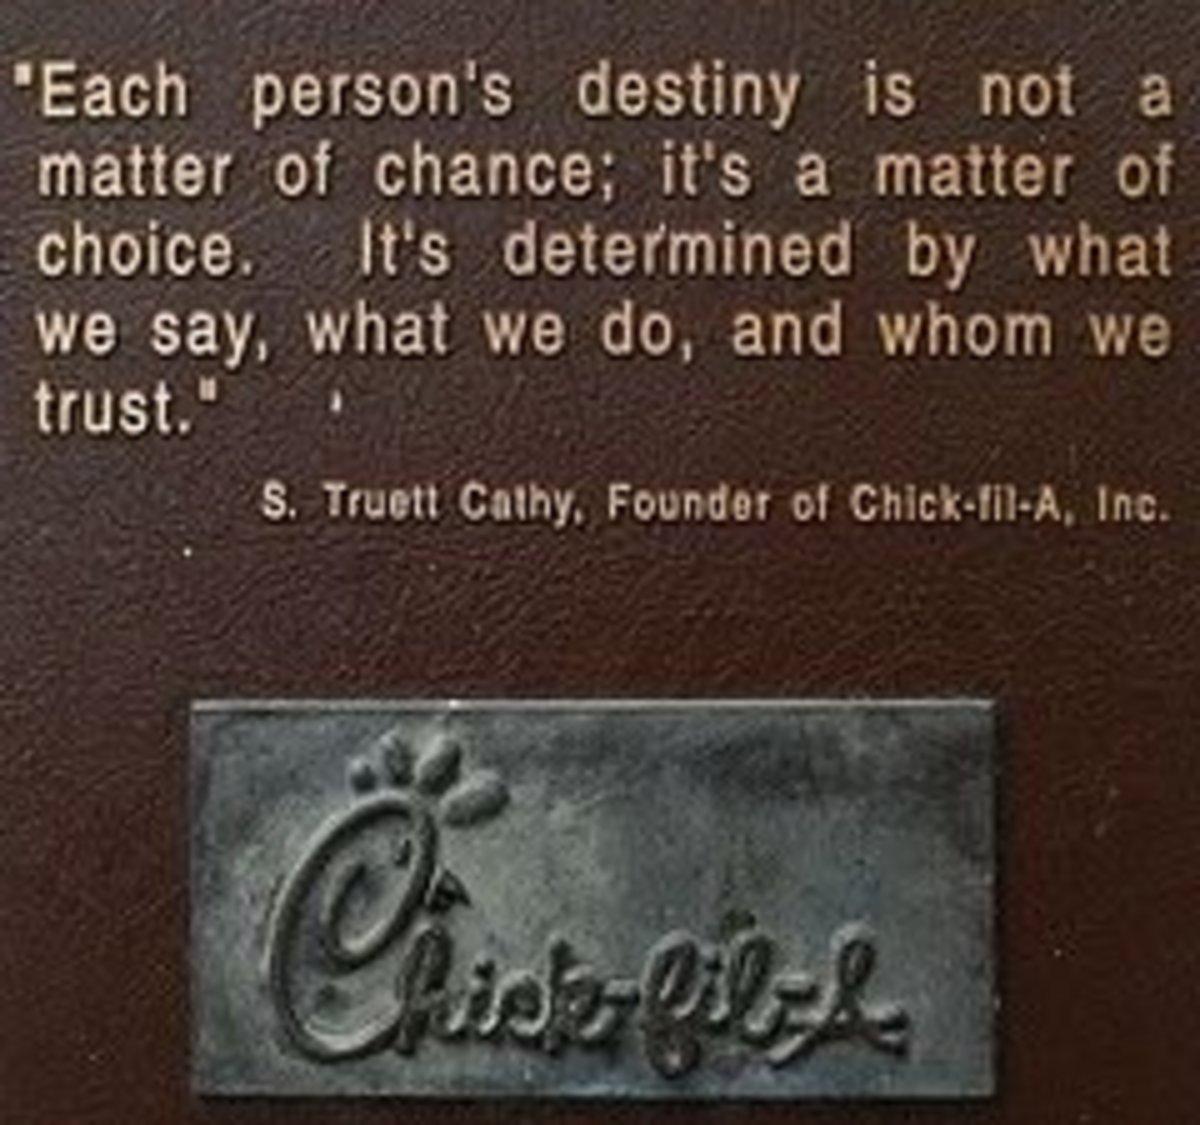 S. Truett Cathy Quote by dbking